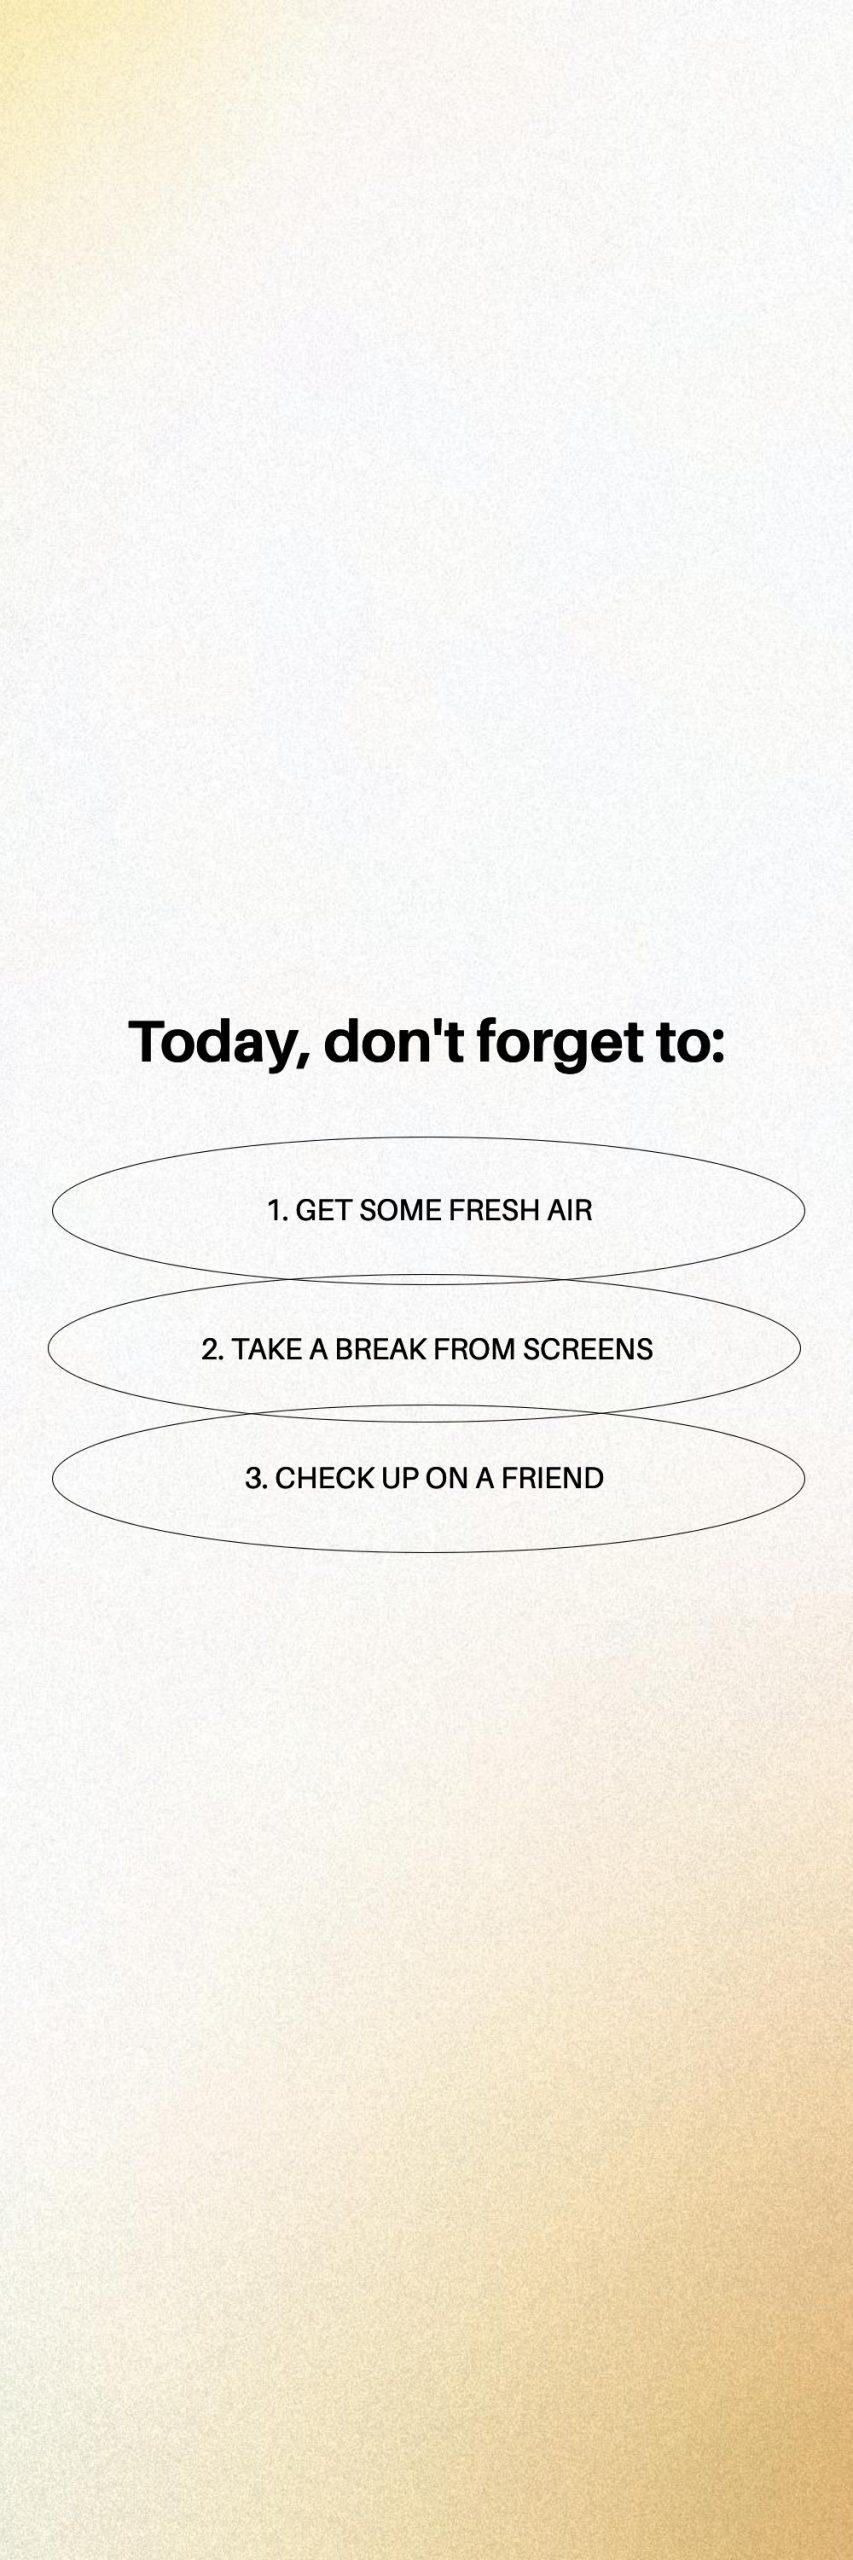 Pinterest Infographic Example